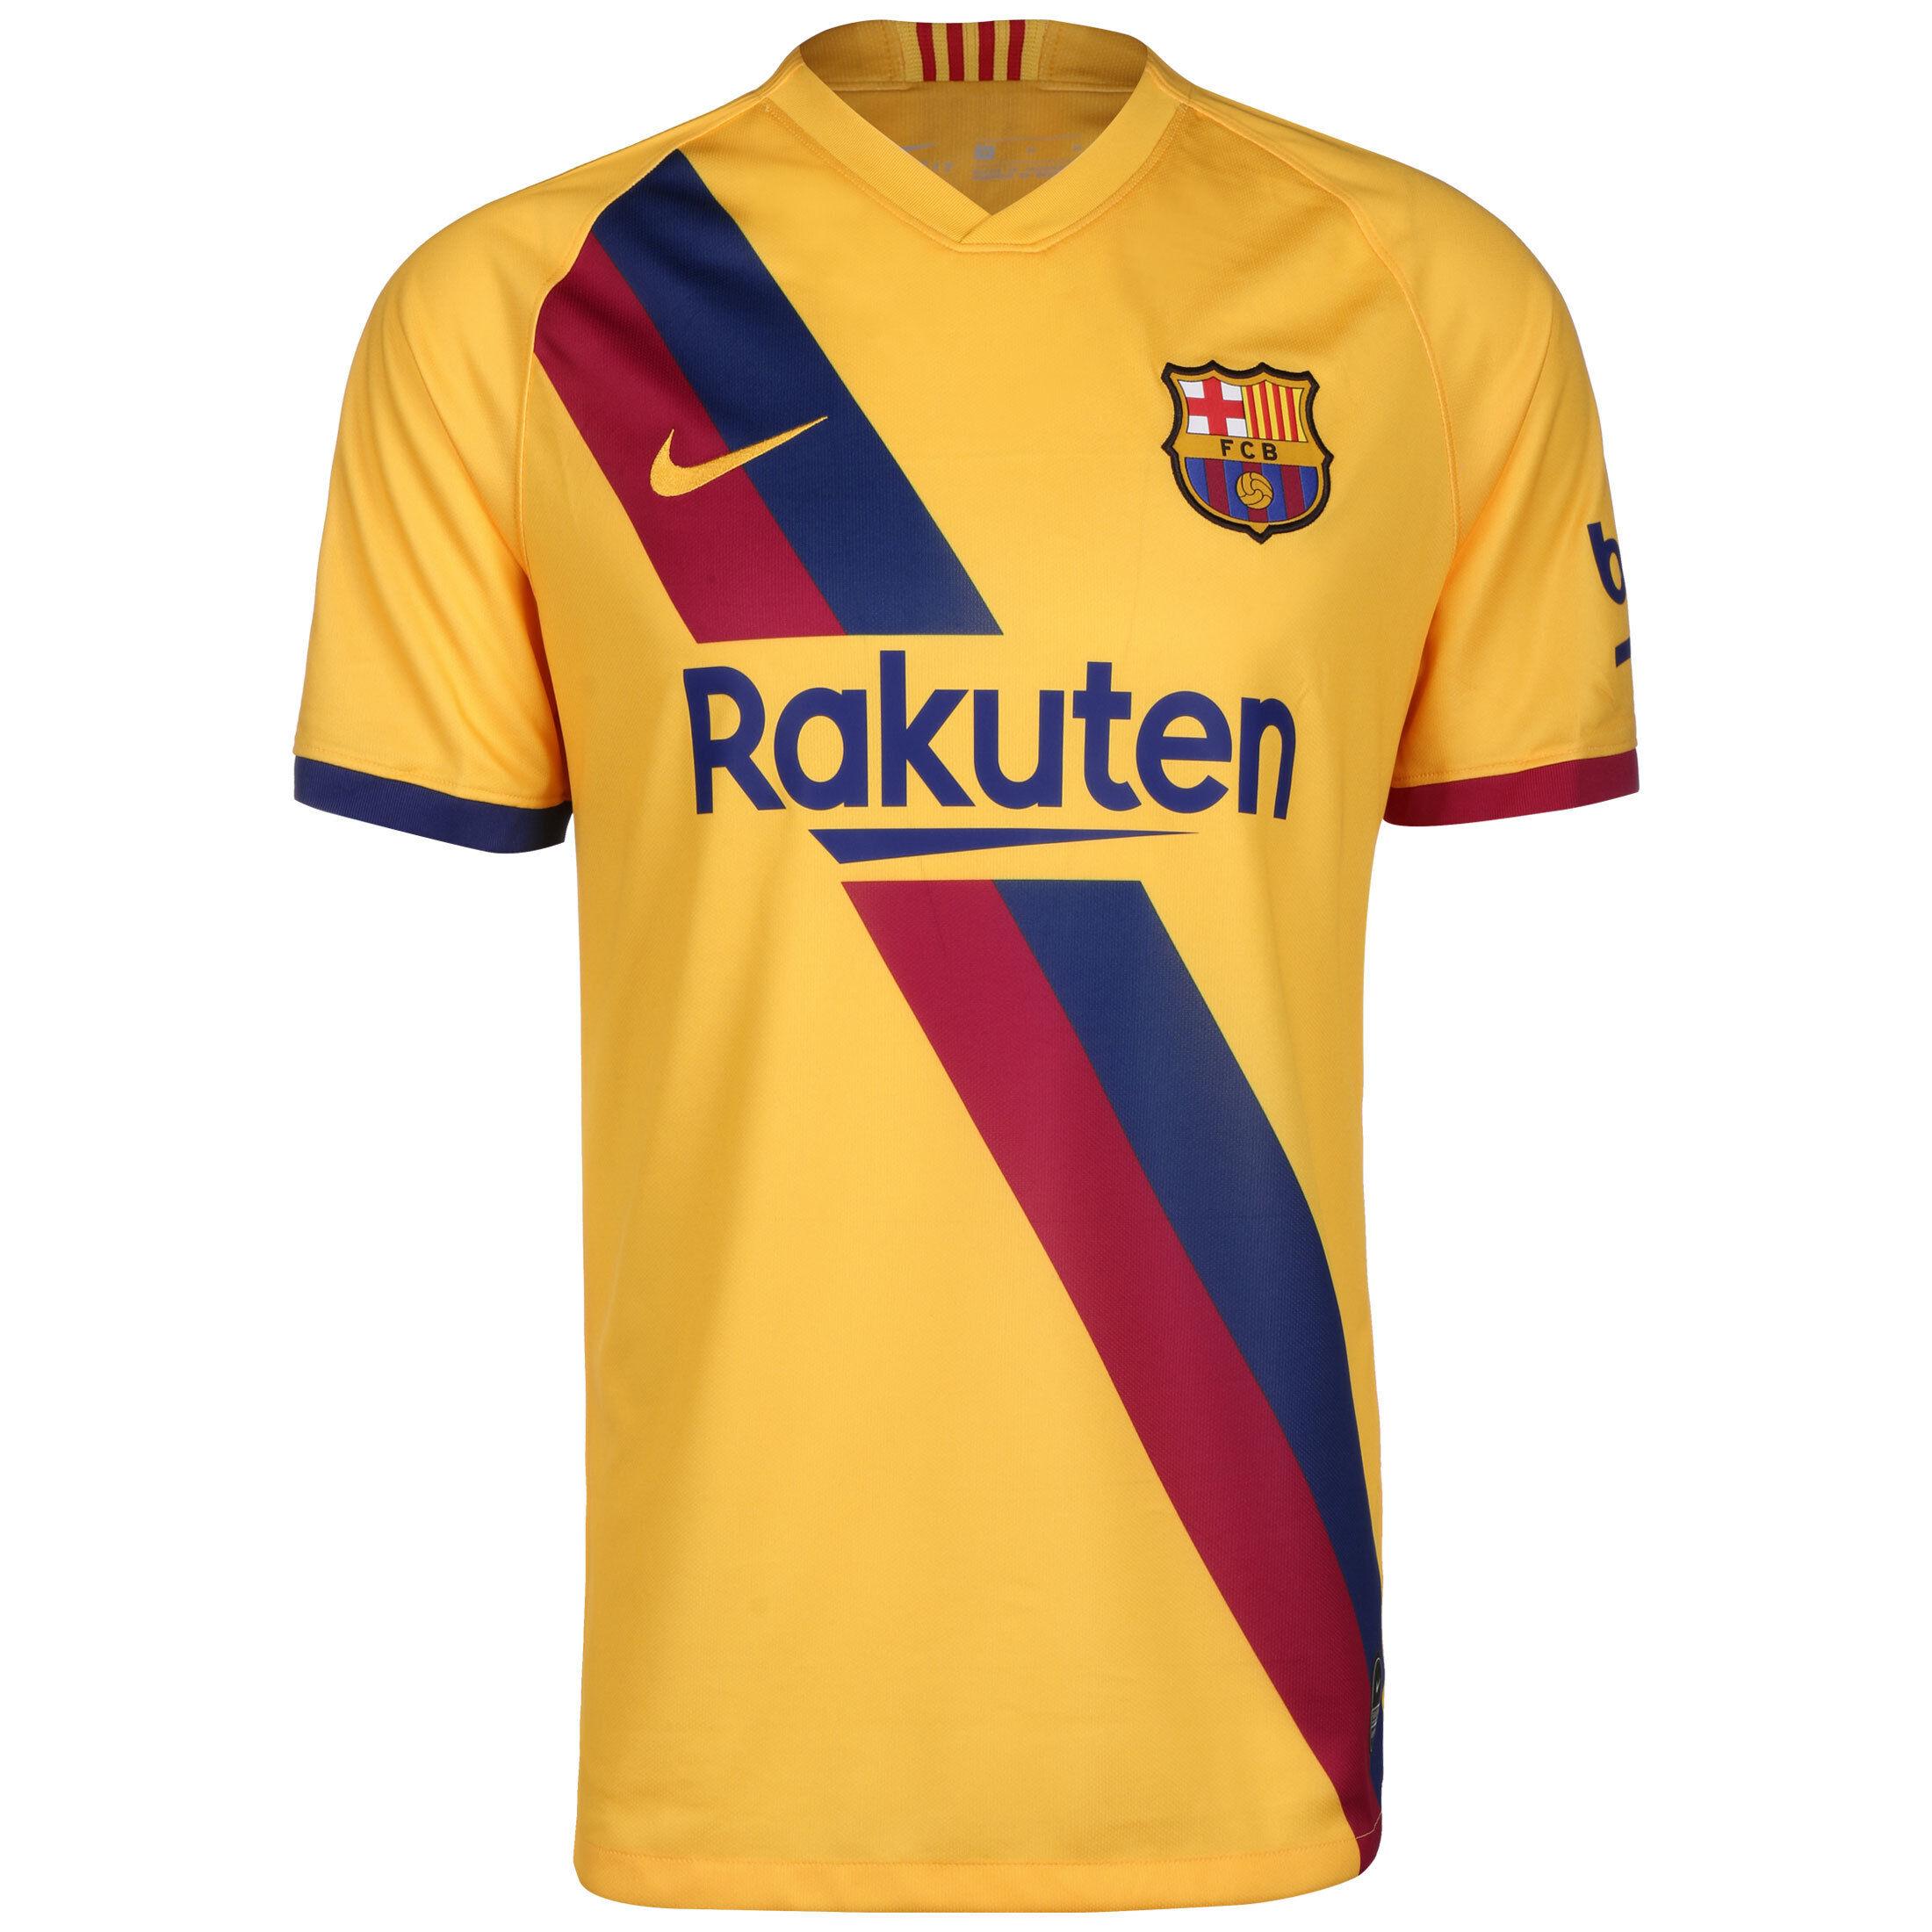 Bei BarcelonaFanshop Fc Bei BarcelonaFanshop Fc BarcelonaFanshop Fc Bei Outfitter Outfitter jAqRLc354